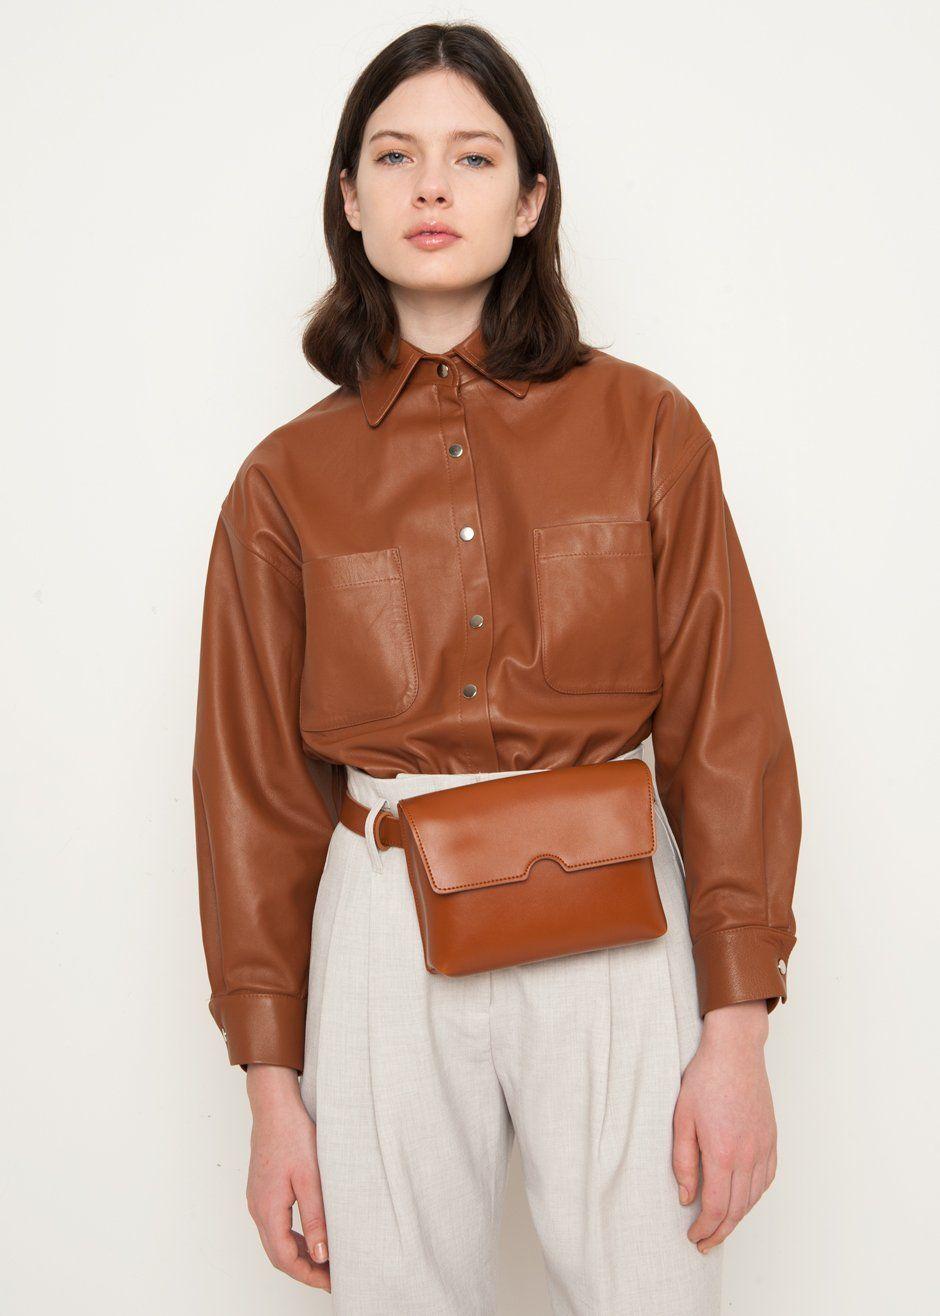 aee82fc5e0 ...  Georgia  Brown  Natural  Leather  Shirt  Bodysuit  thefrankieshop   frankienyc  frankiegirl Situationist Brown Leather Bodysuit – The Frankie  Shop